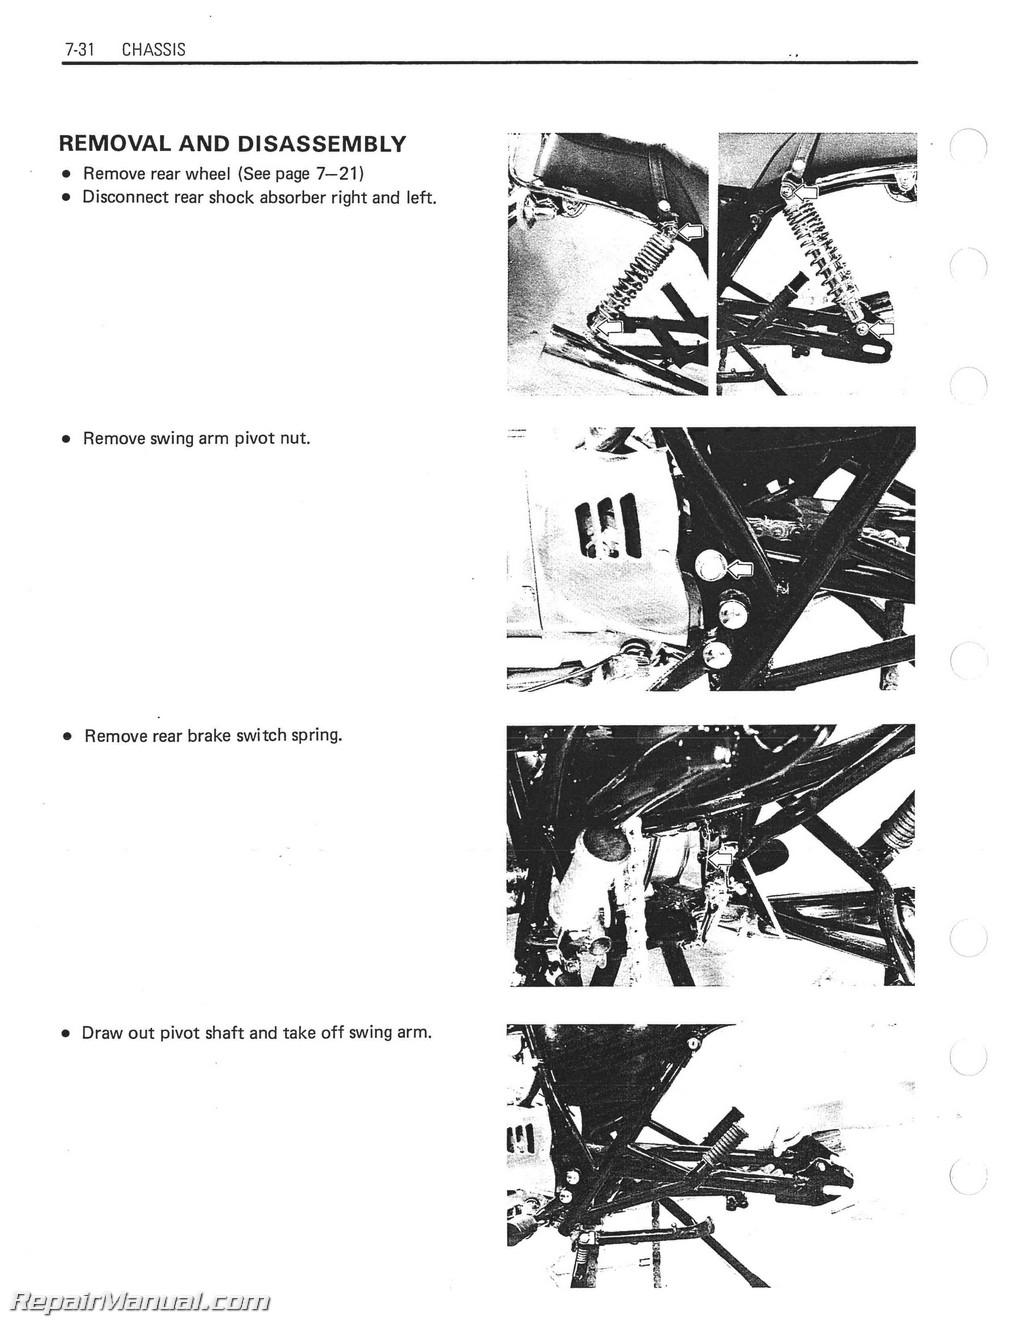 1983-1988 Suzuki GN250 Motorcycle Service Manual